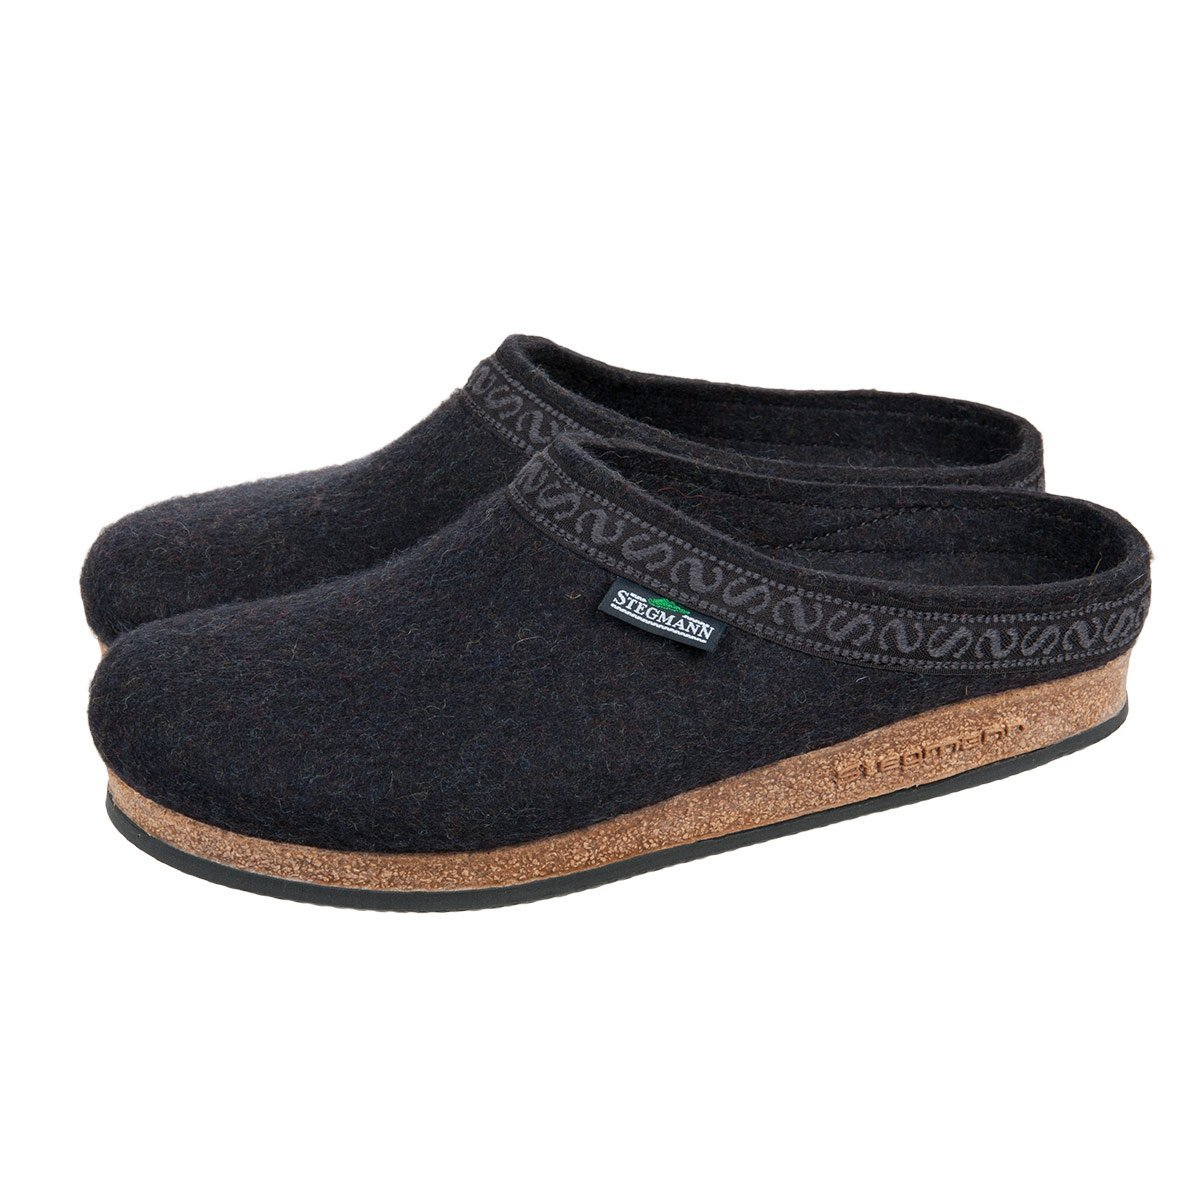 c3d5ef7059936 pantofole in feltro STEGMANN di ottima qualità ...